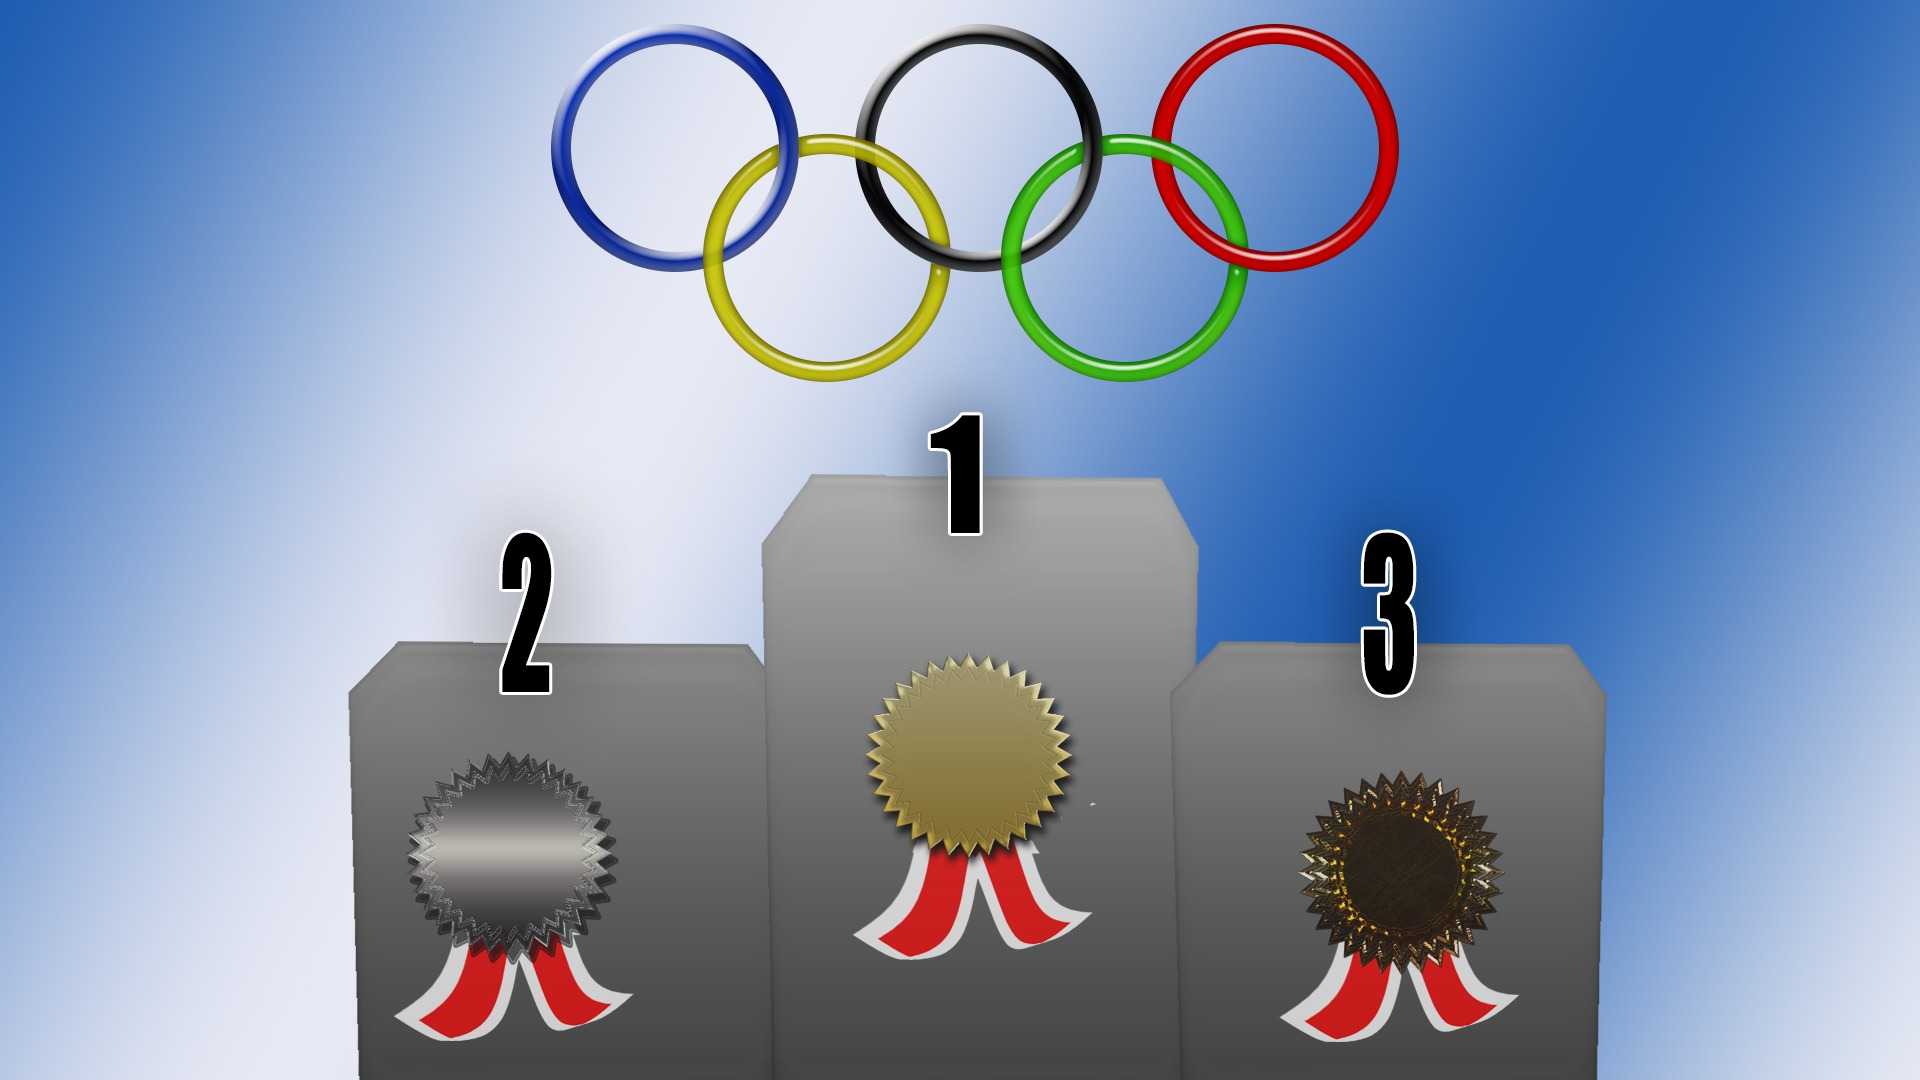 Картинки по запросу олимпийский пьедестал